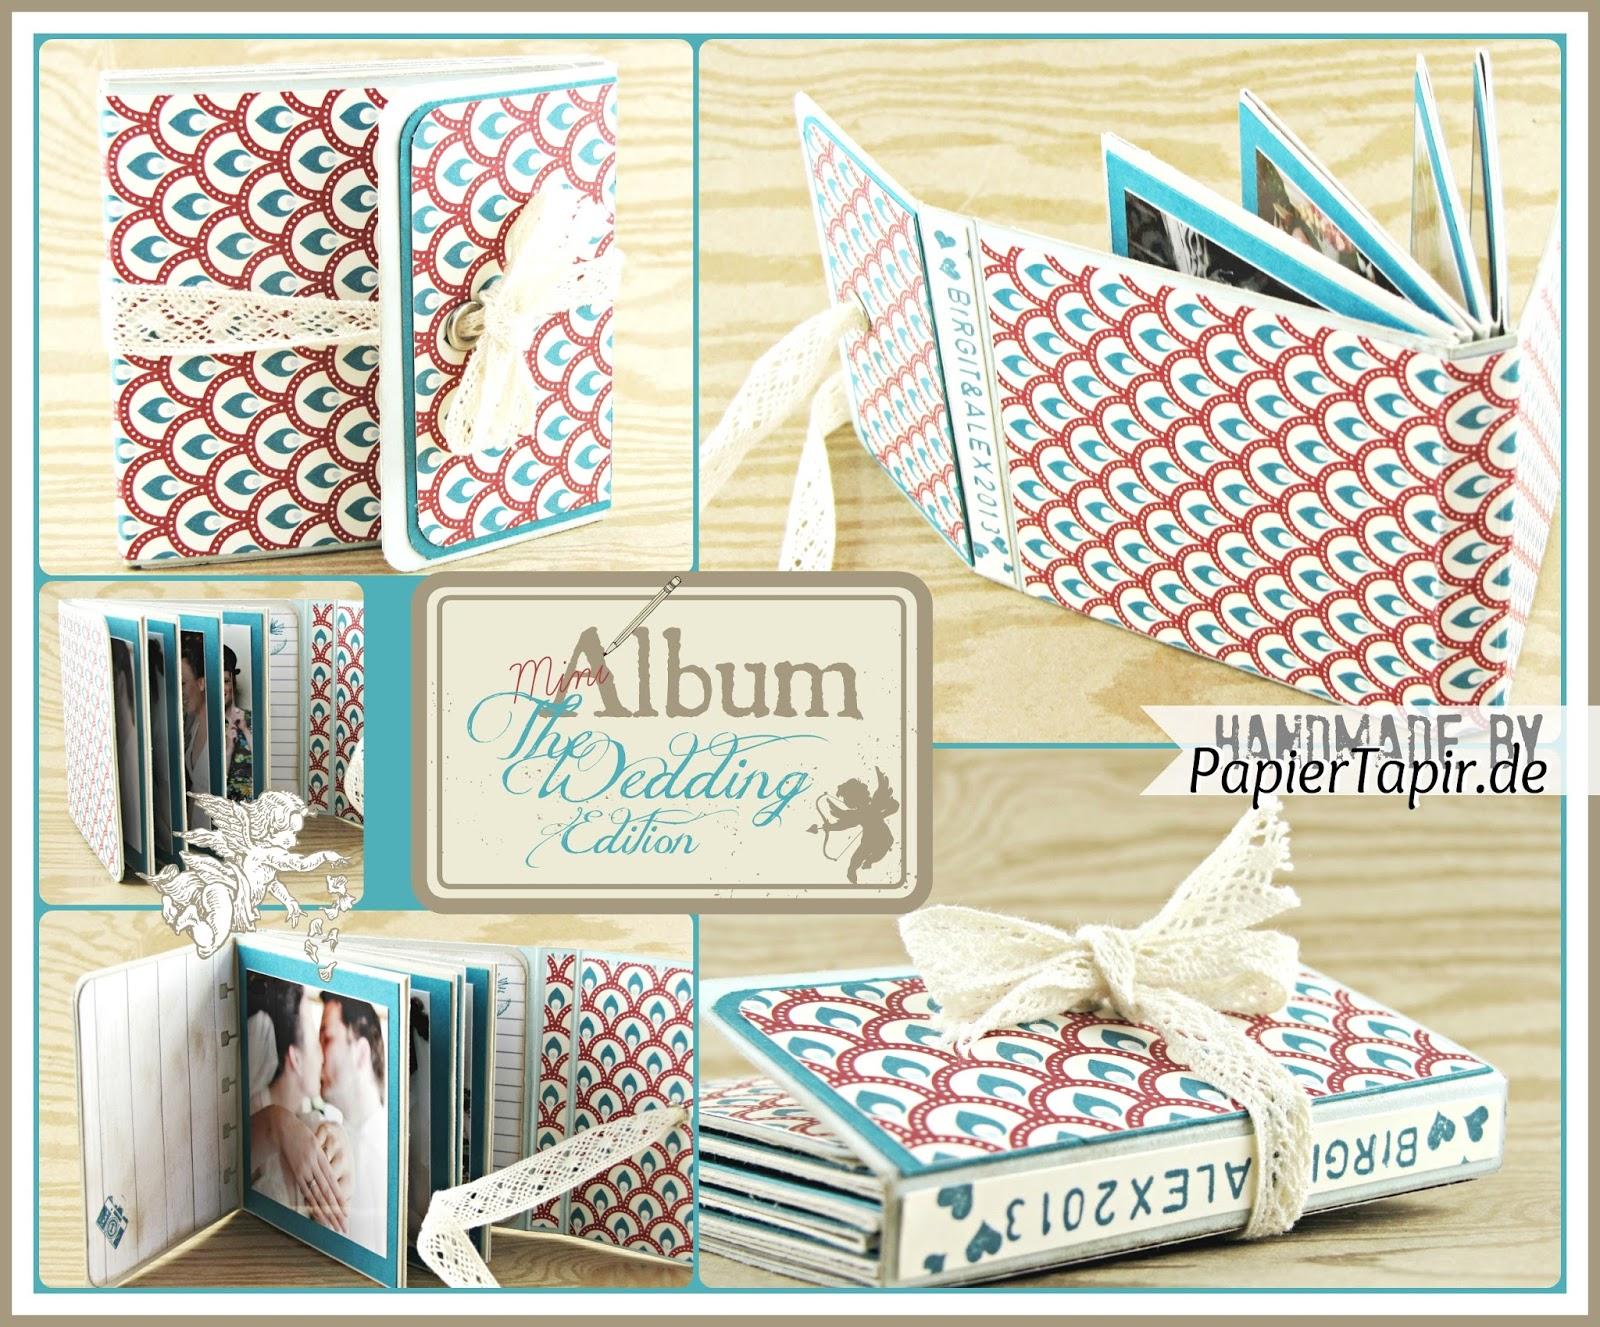 papiertapir mini album wedding edition. Black Bedroom Furniture Sets. Home Design Ideas